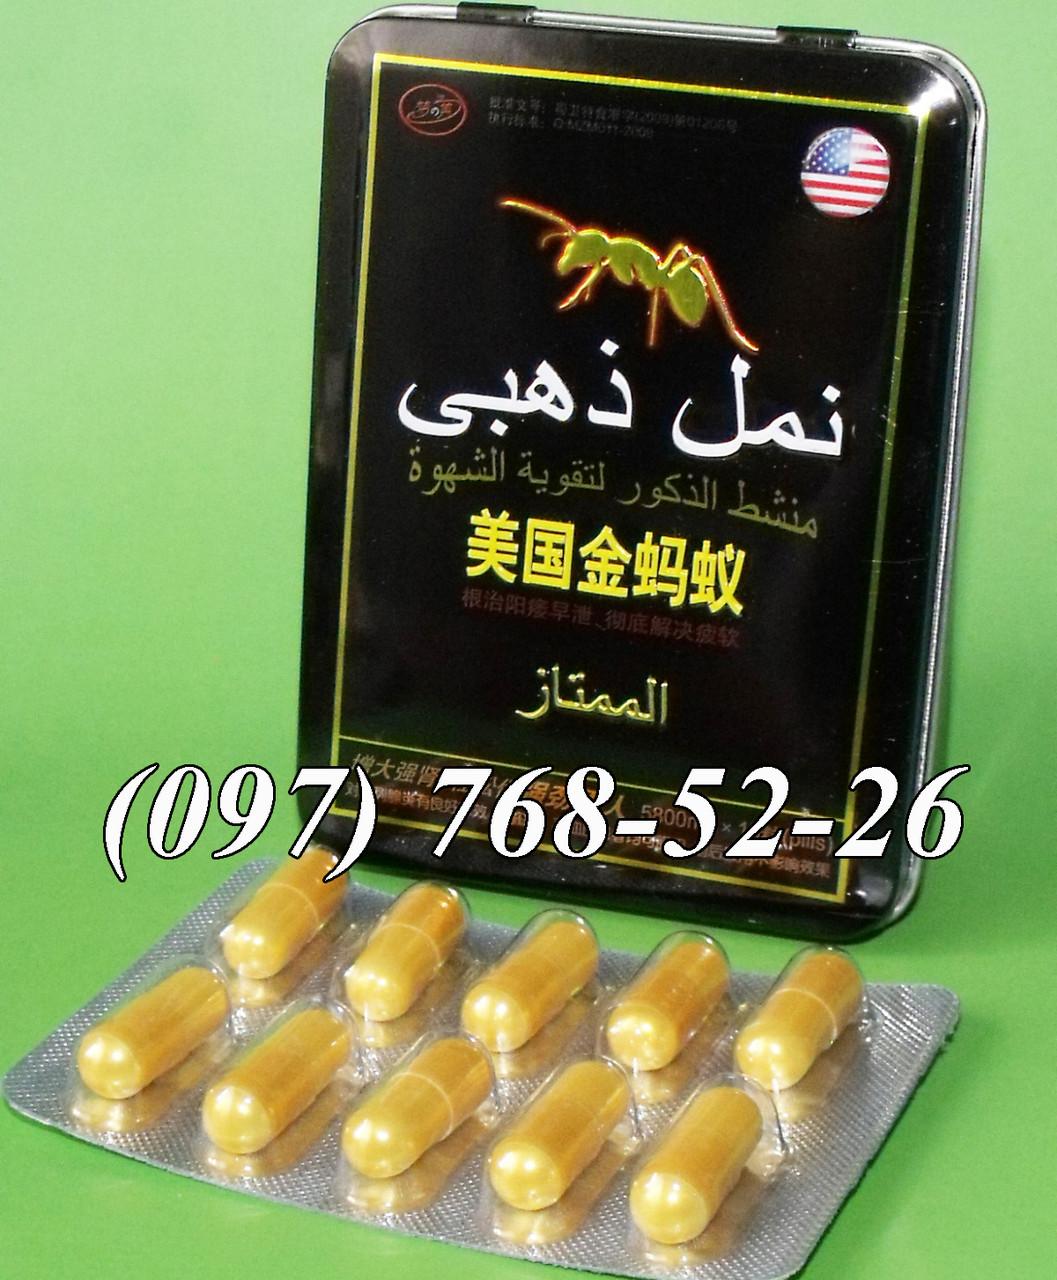 Золотой Мураве - Gold Ant - препарат для потенции: <b>Купить</b> ...